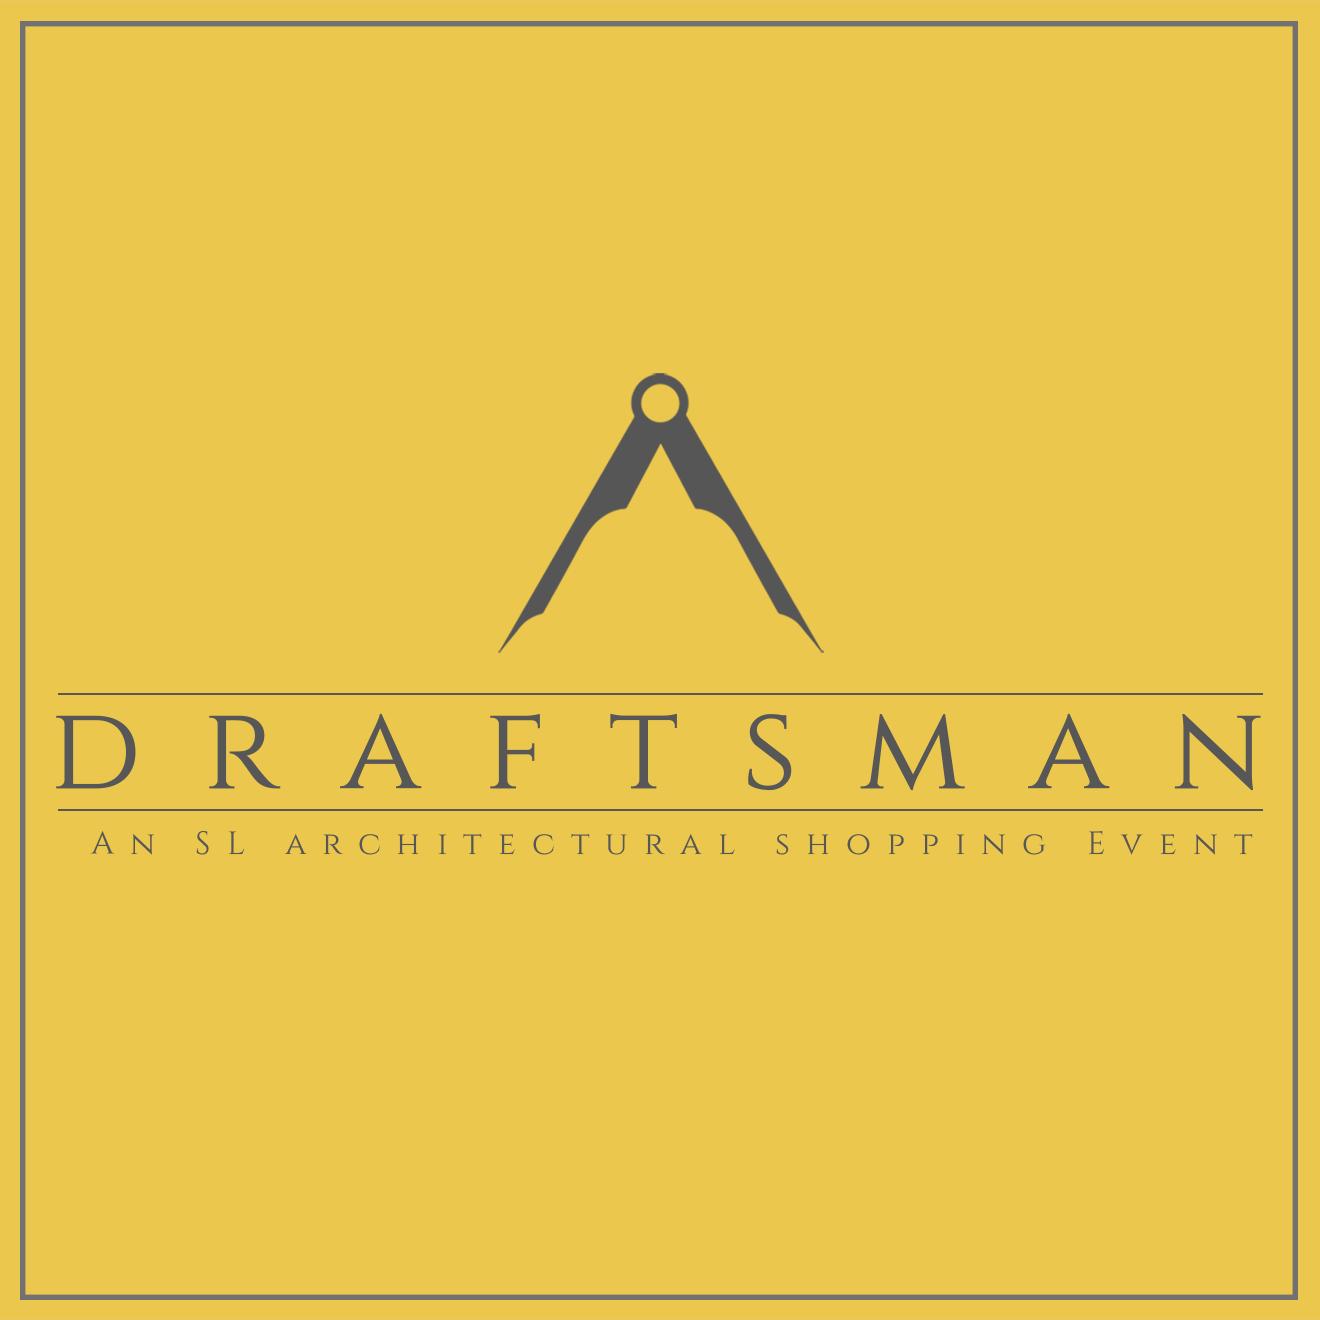 [Draftsman] - An SL Architecture Event